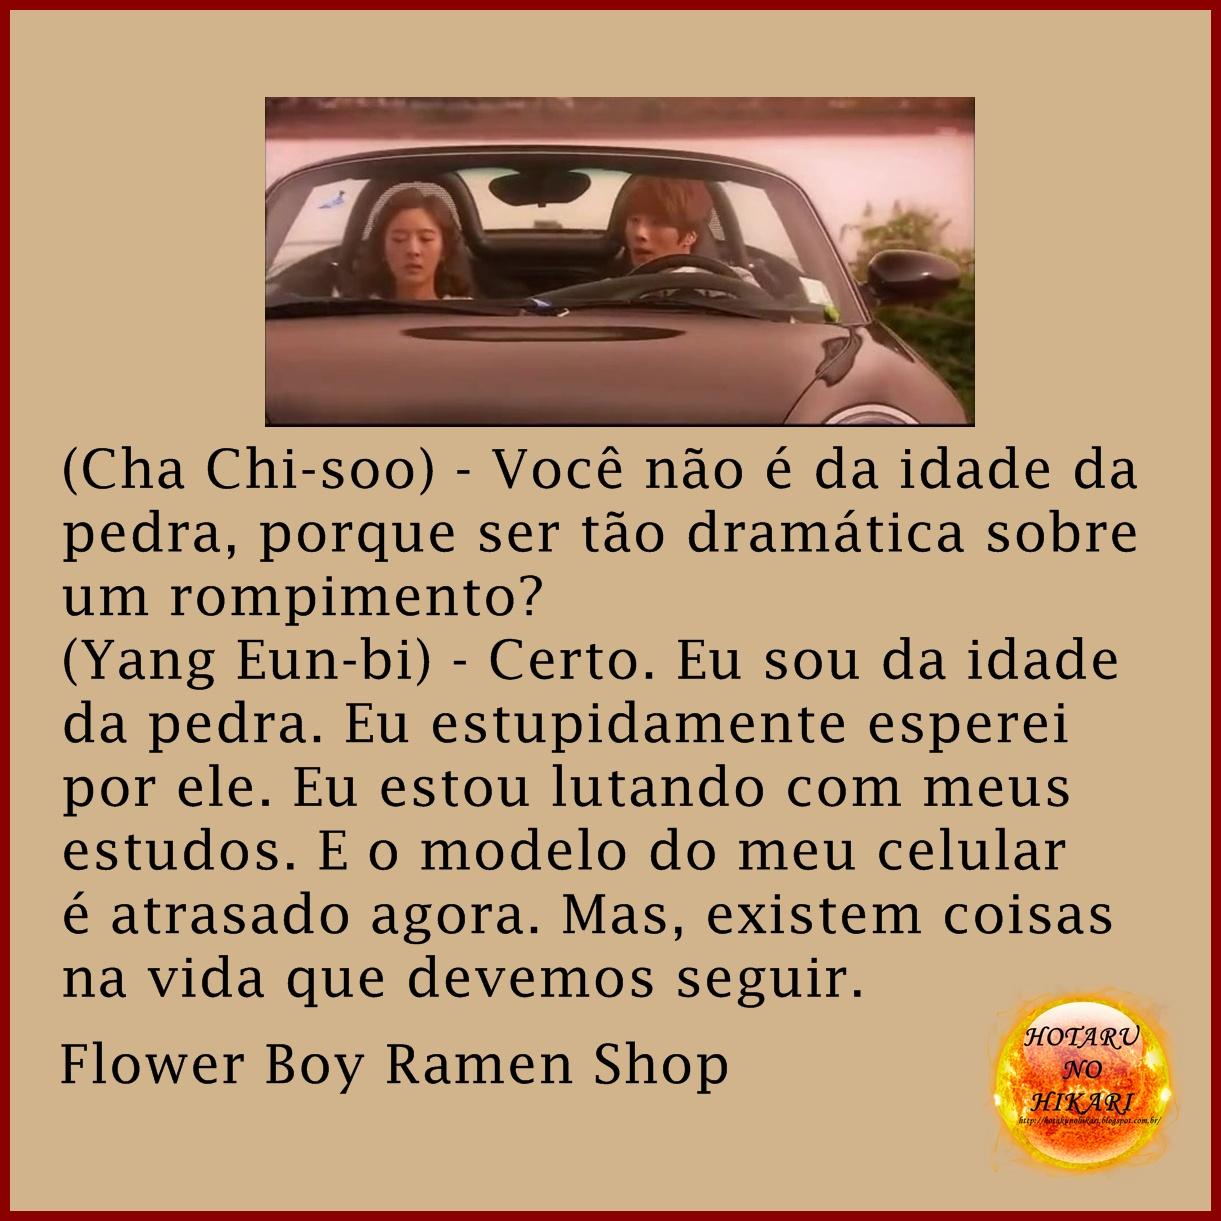 HOTARU NO HIKARI Frases de Flower Boy Ramen Shop 1